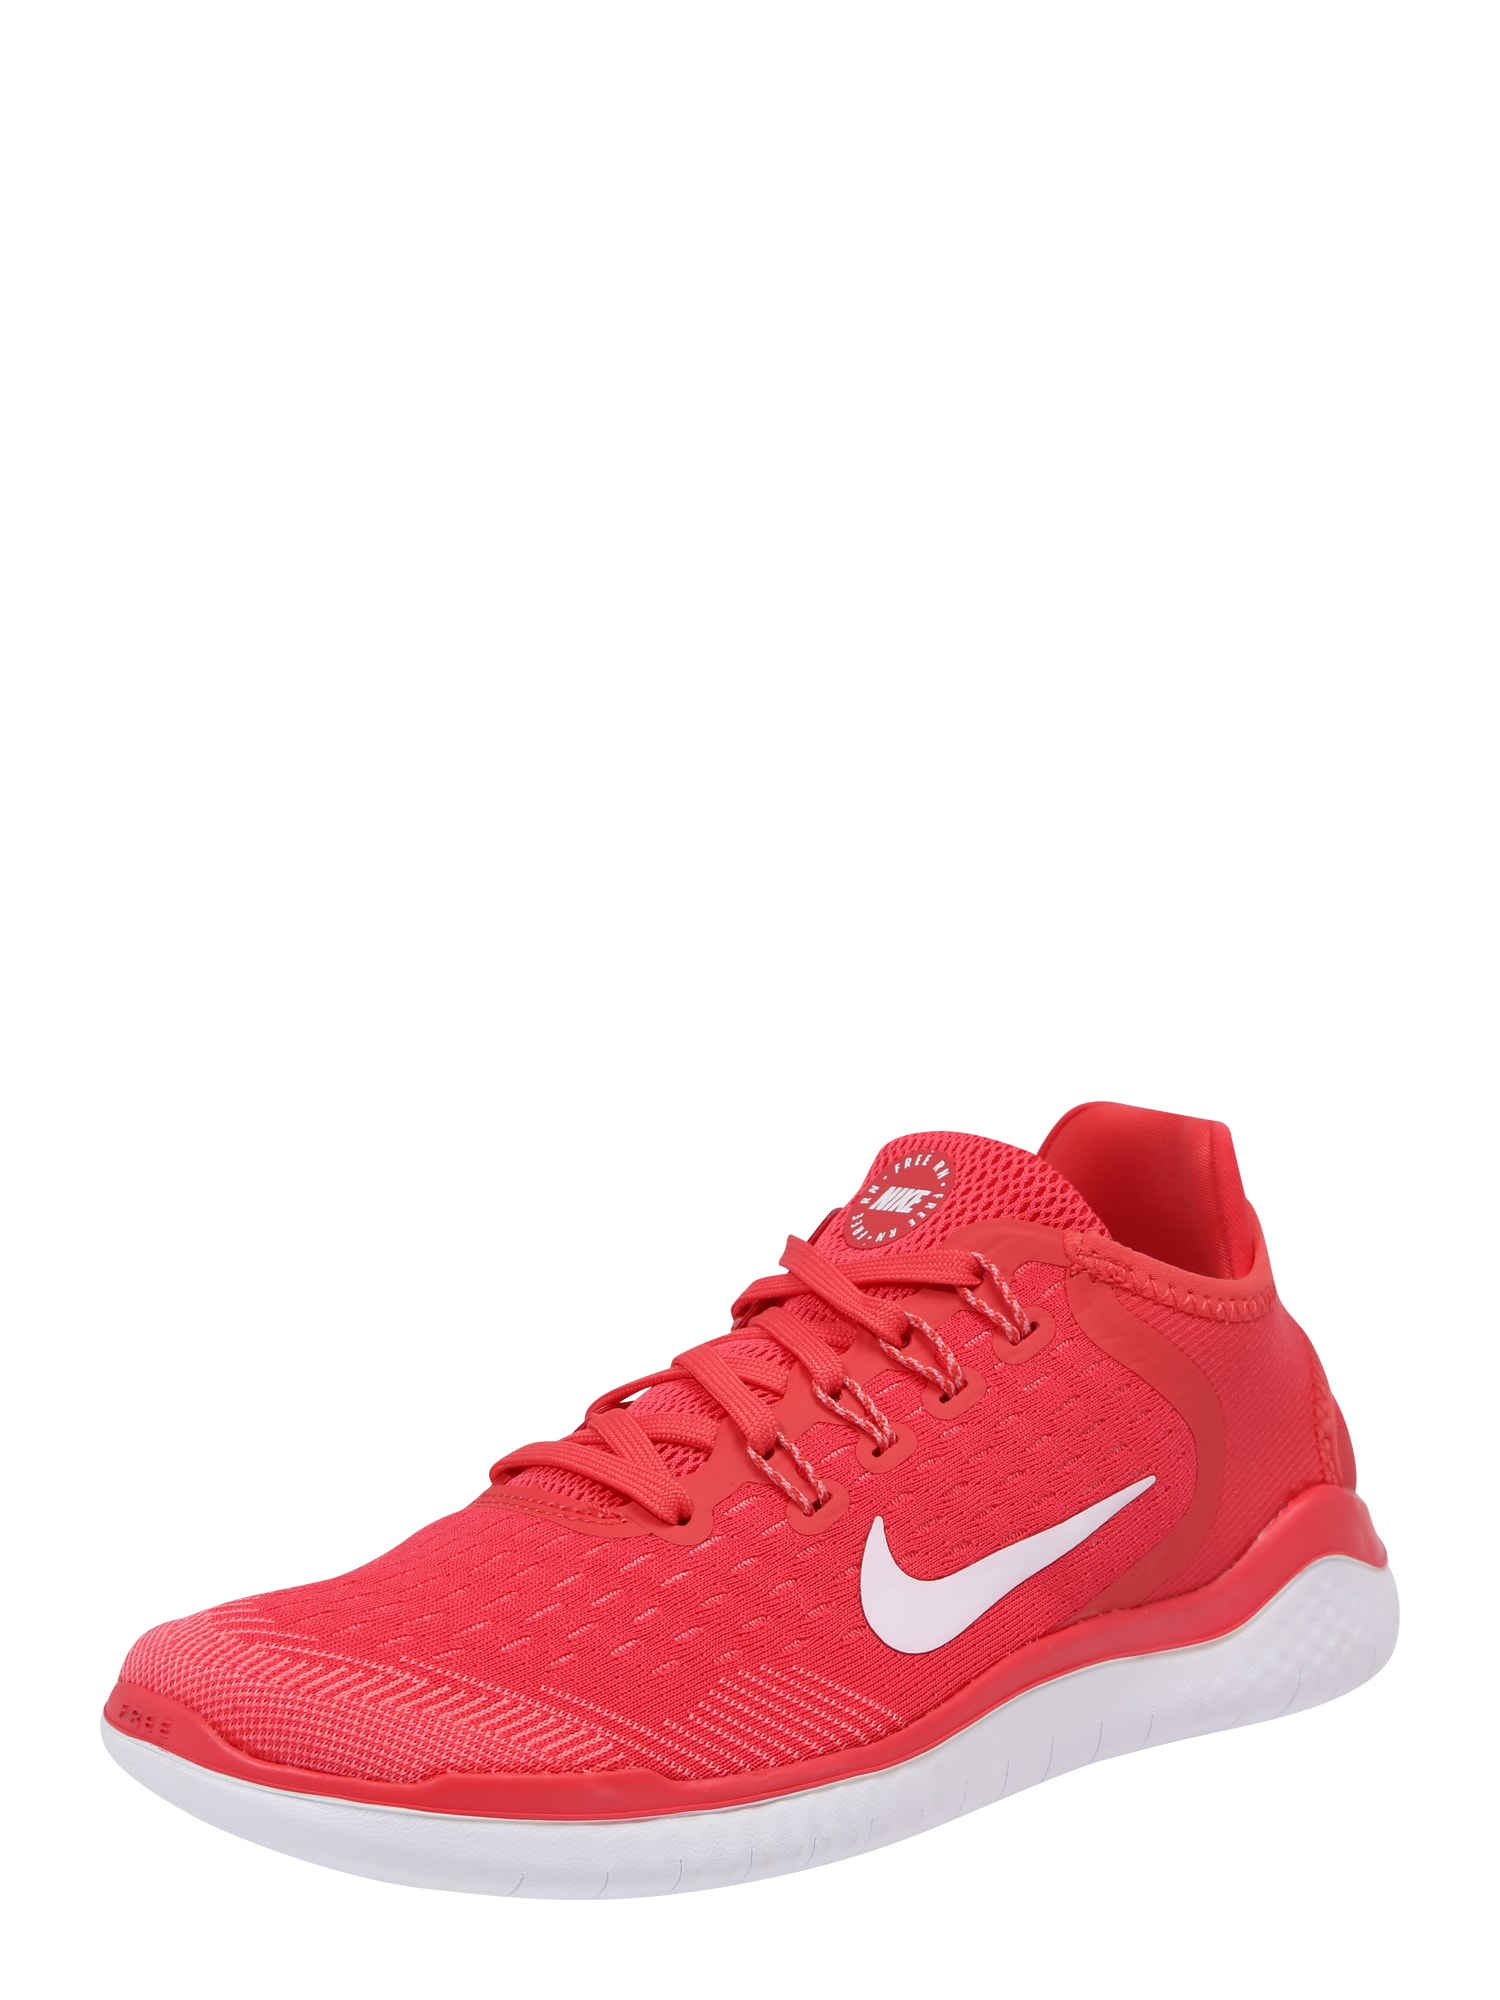 Běžecká obuv Free RN červená NIKE